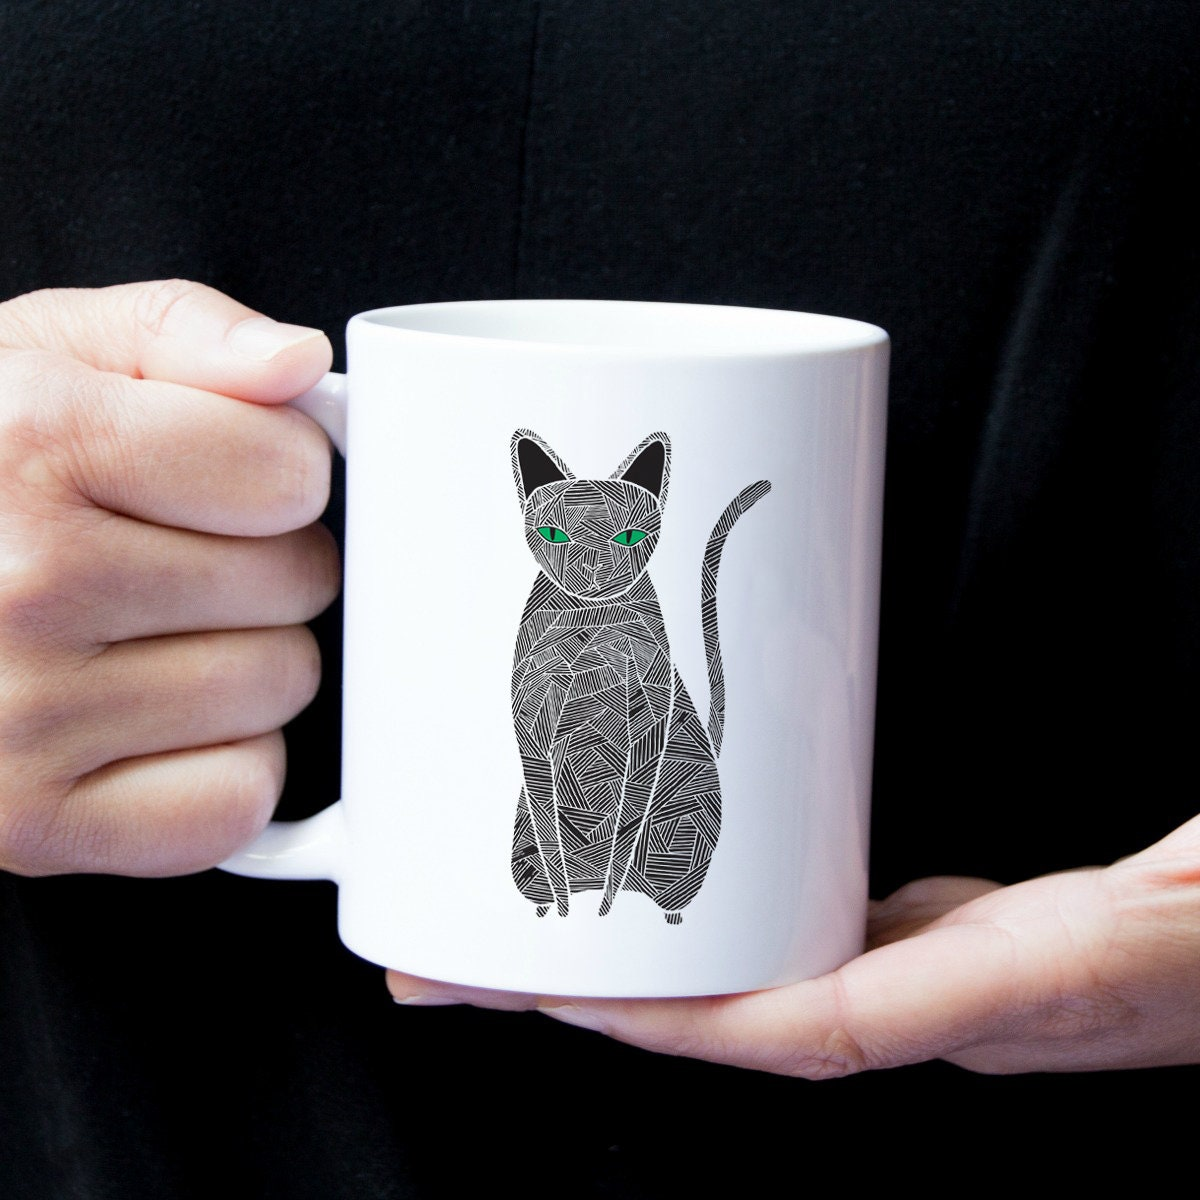 Personalized Black Cat Mug Black Cat Coffee Mug Cat Mug Cat Gifts